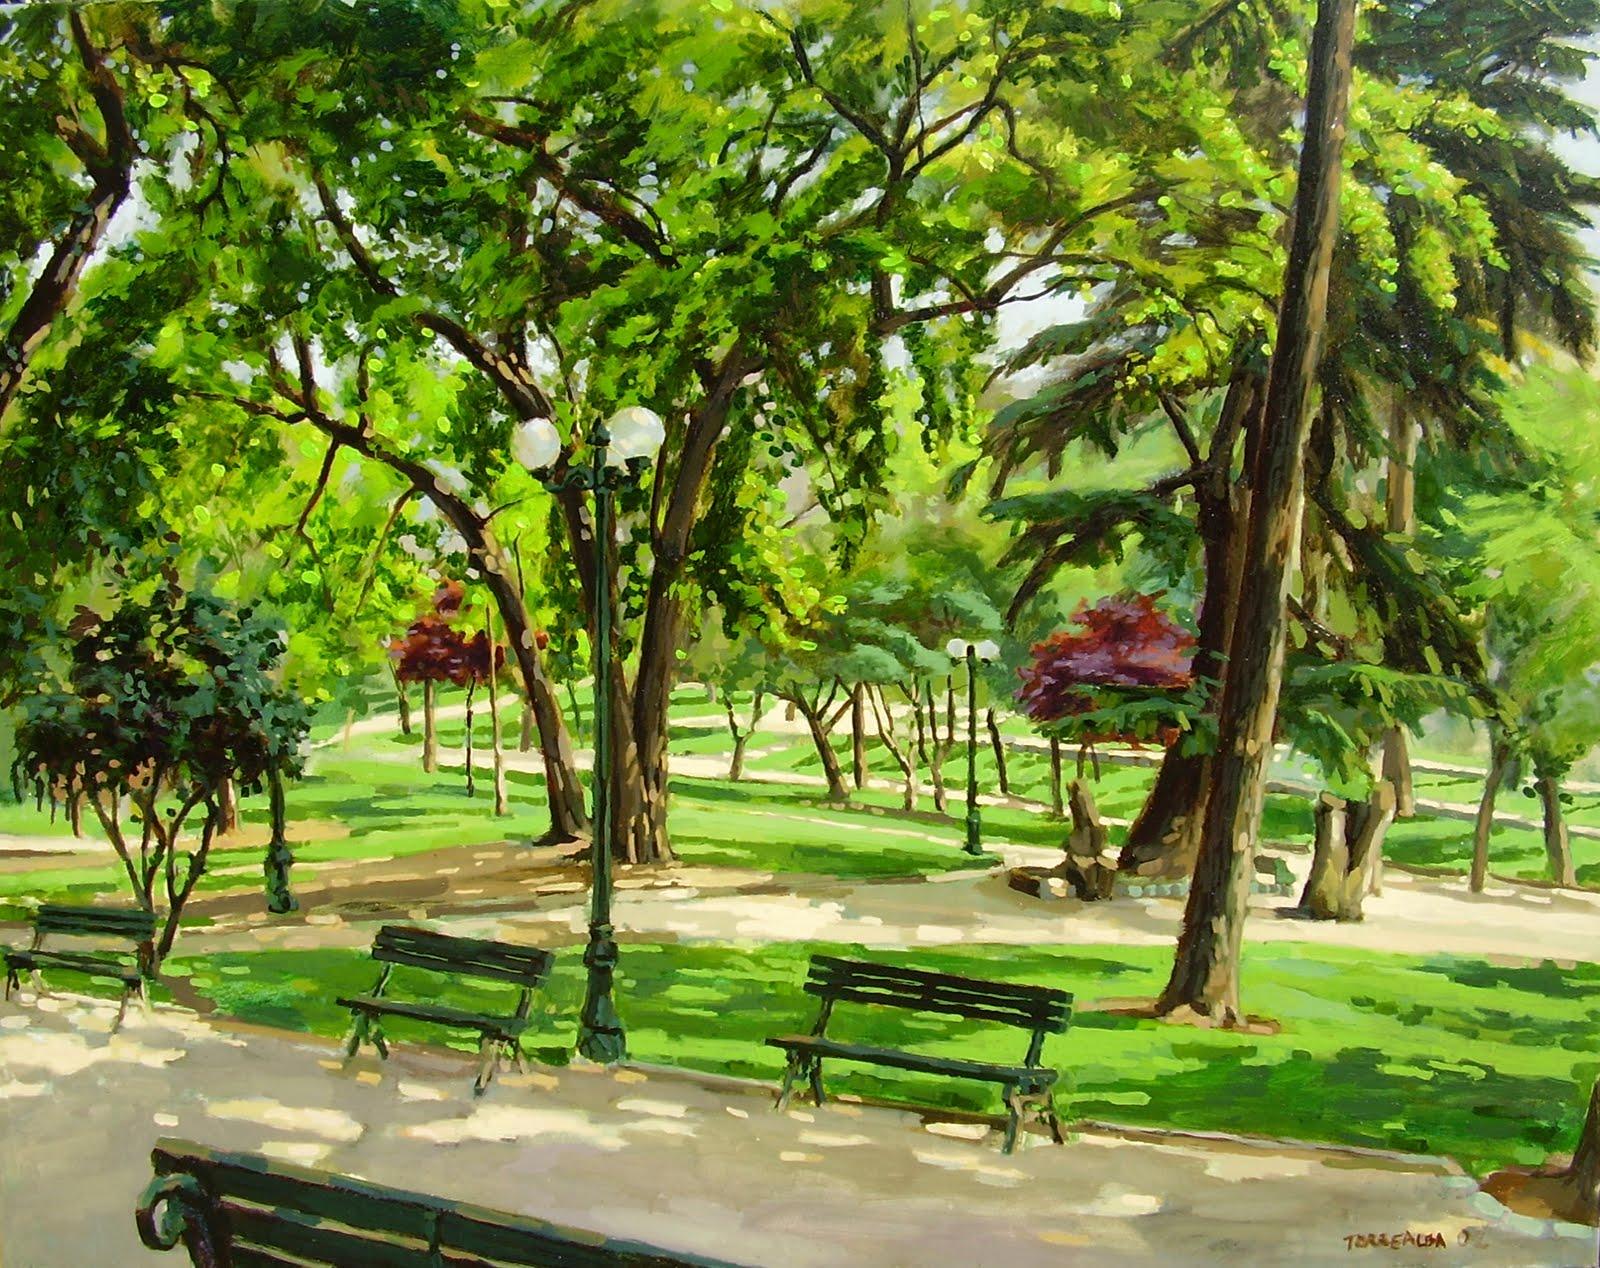 Parque MWL Parque+forestal2007-2